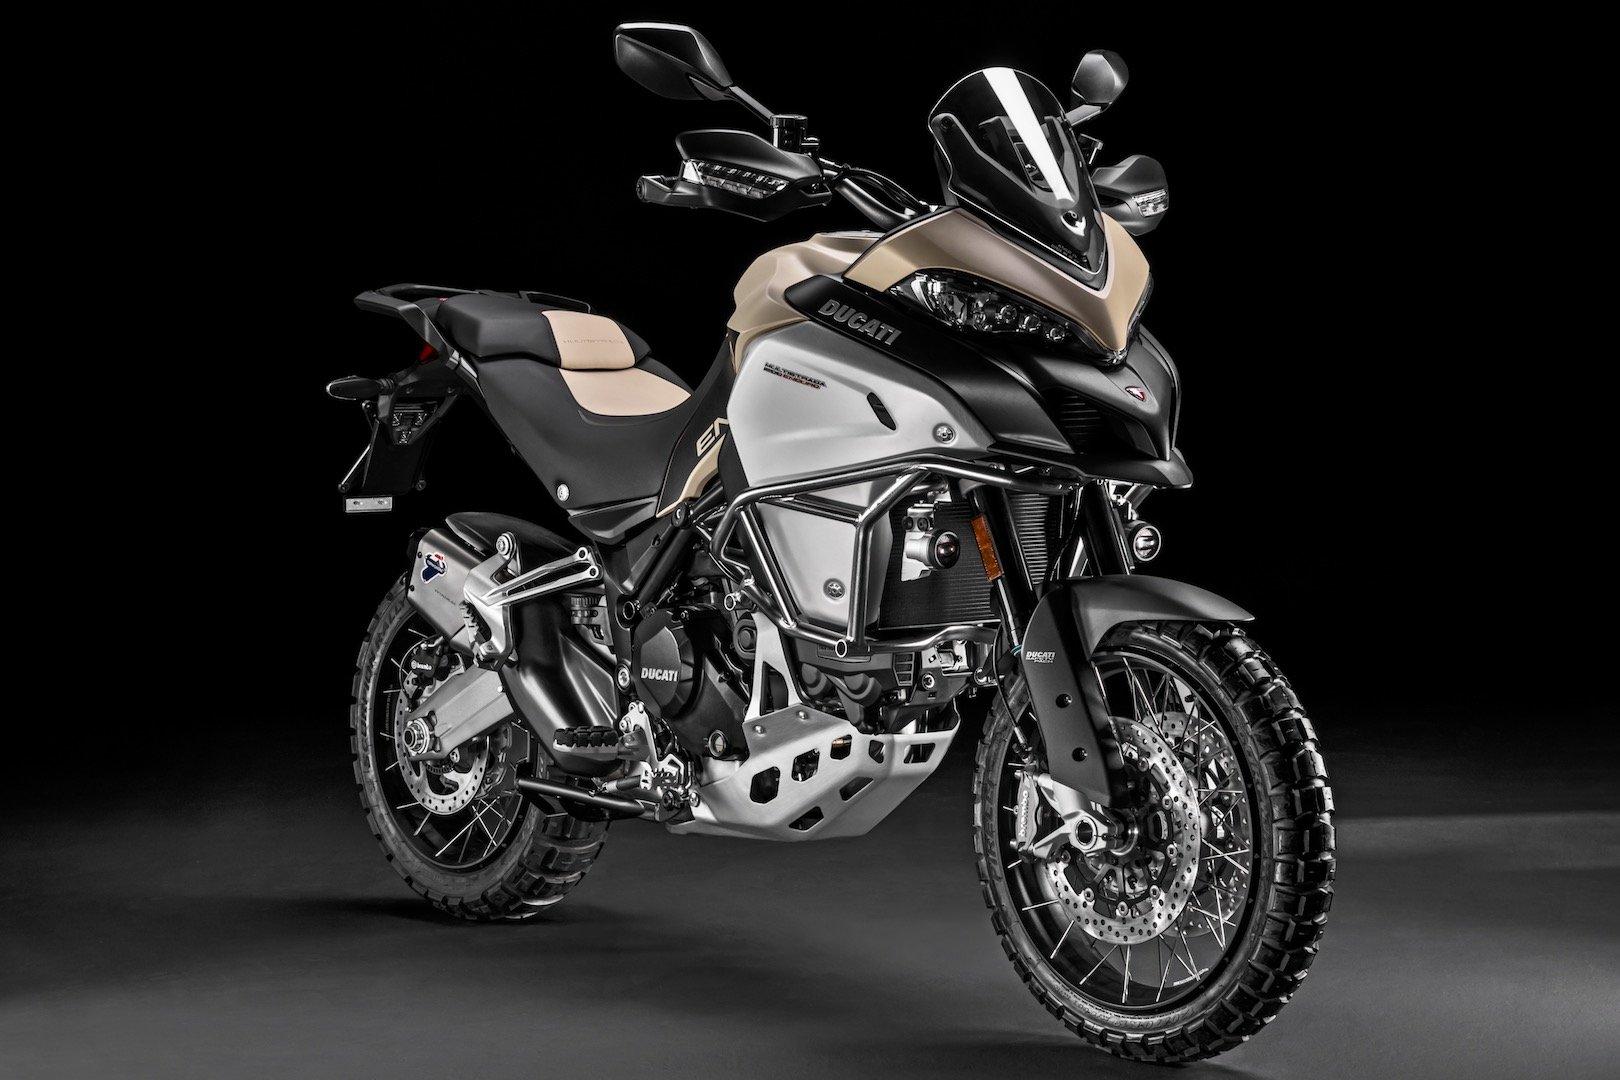 2017 Ducati Multistrada 1200 Enduro Pro